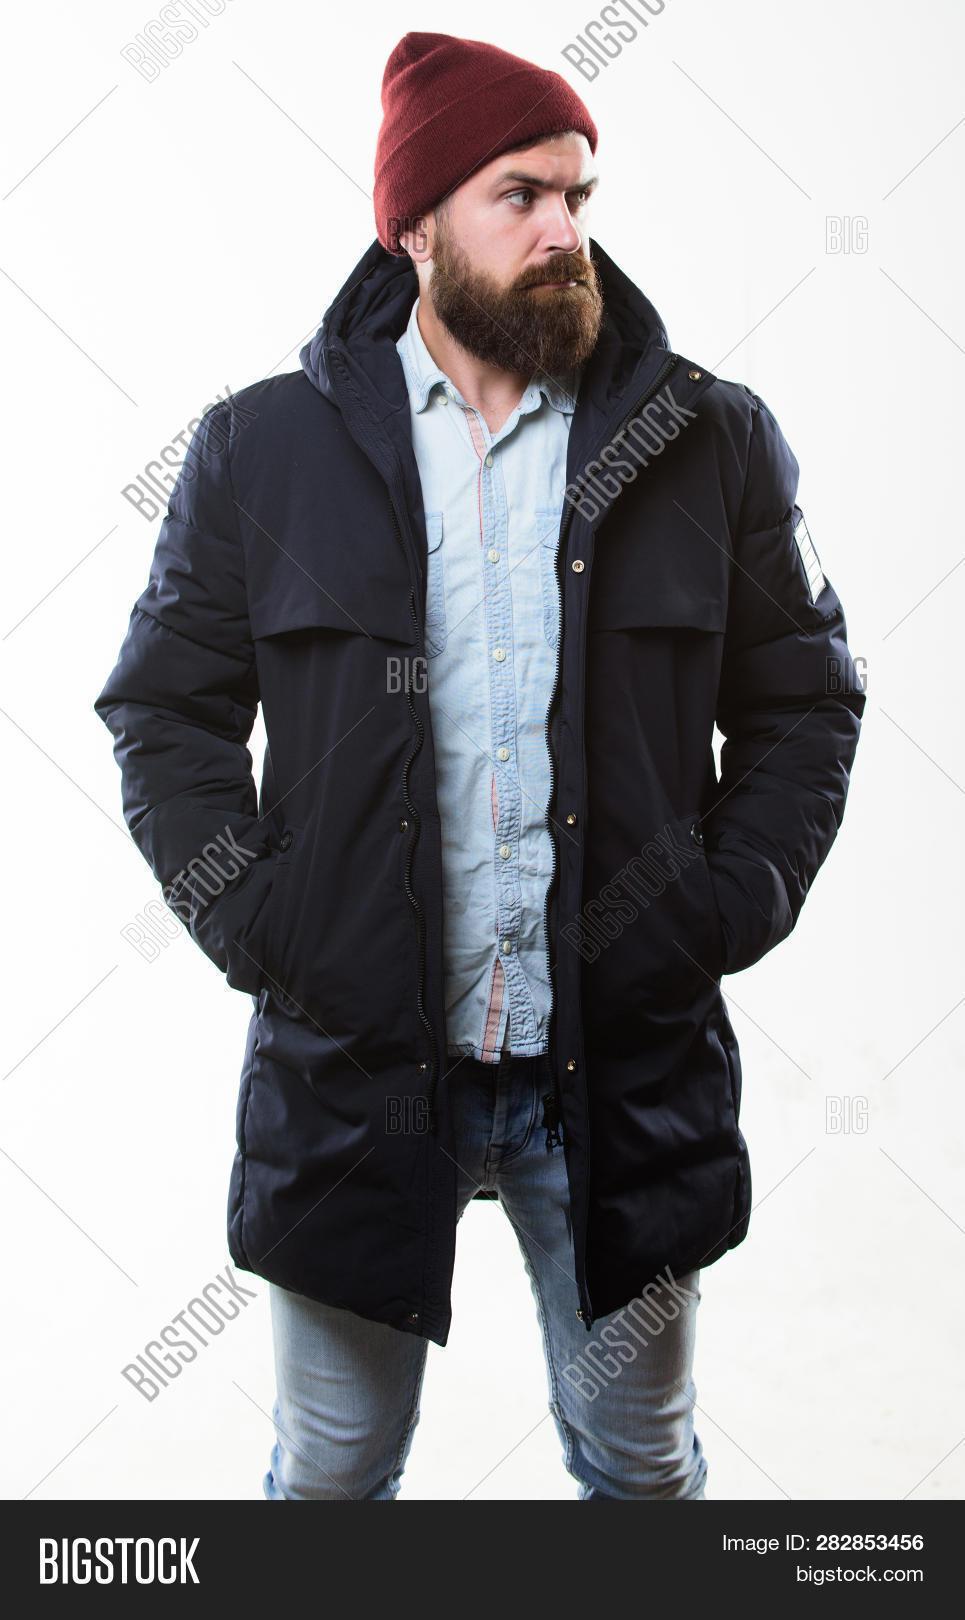 11cf2fa9041 Guy Wear Hat Black Image & Photo (Free Trial) | Bigstock